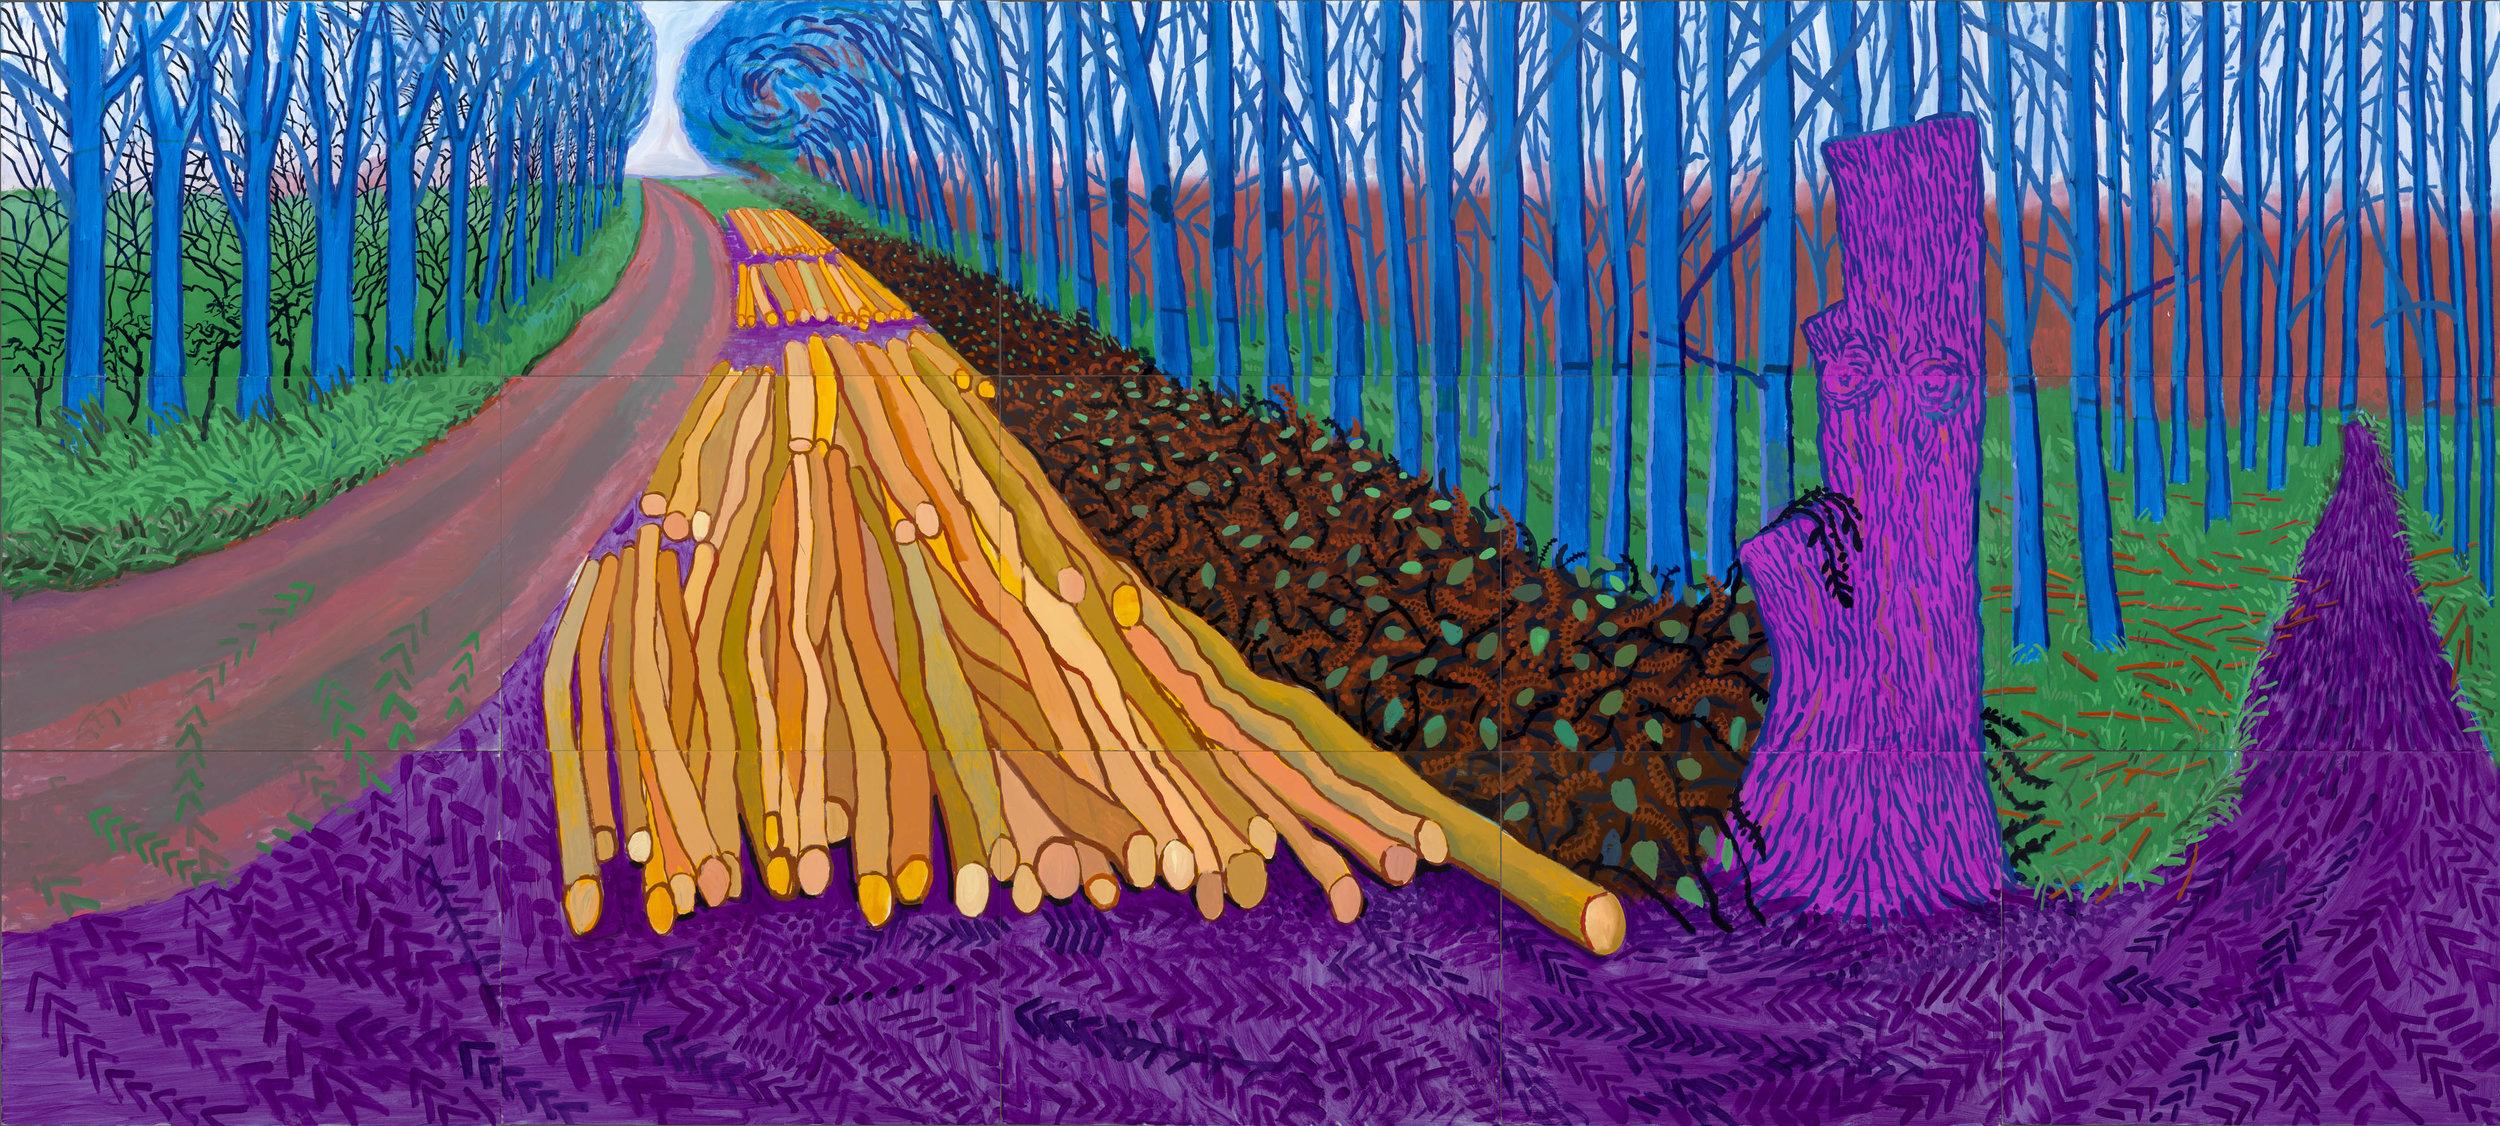 David Hockney: More Felled Trees on Woldgate, 2008.